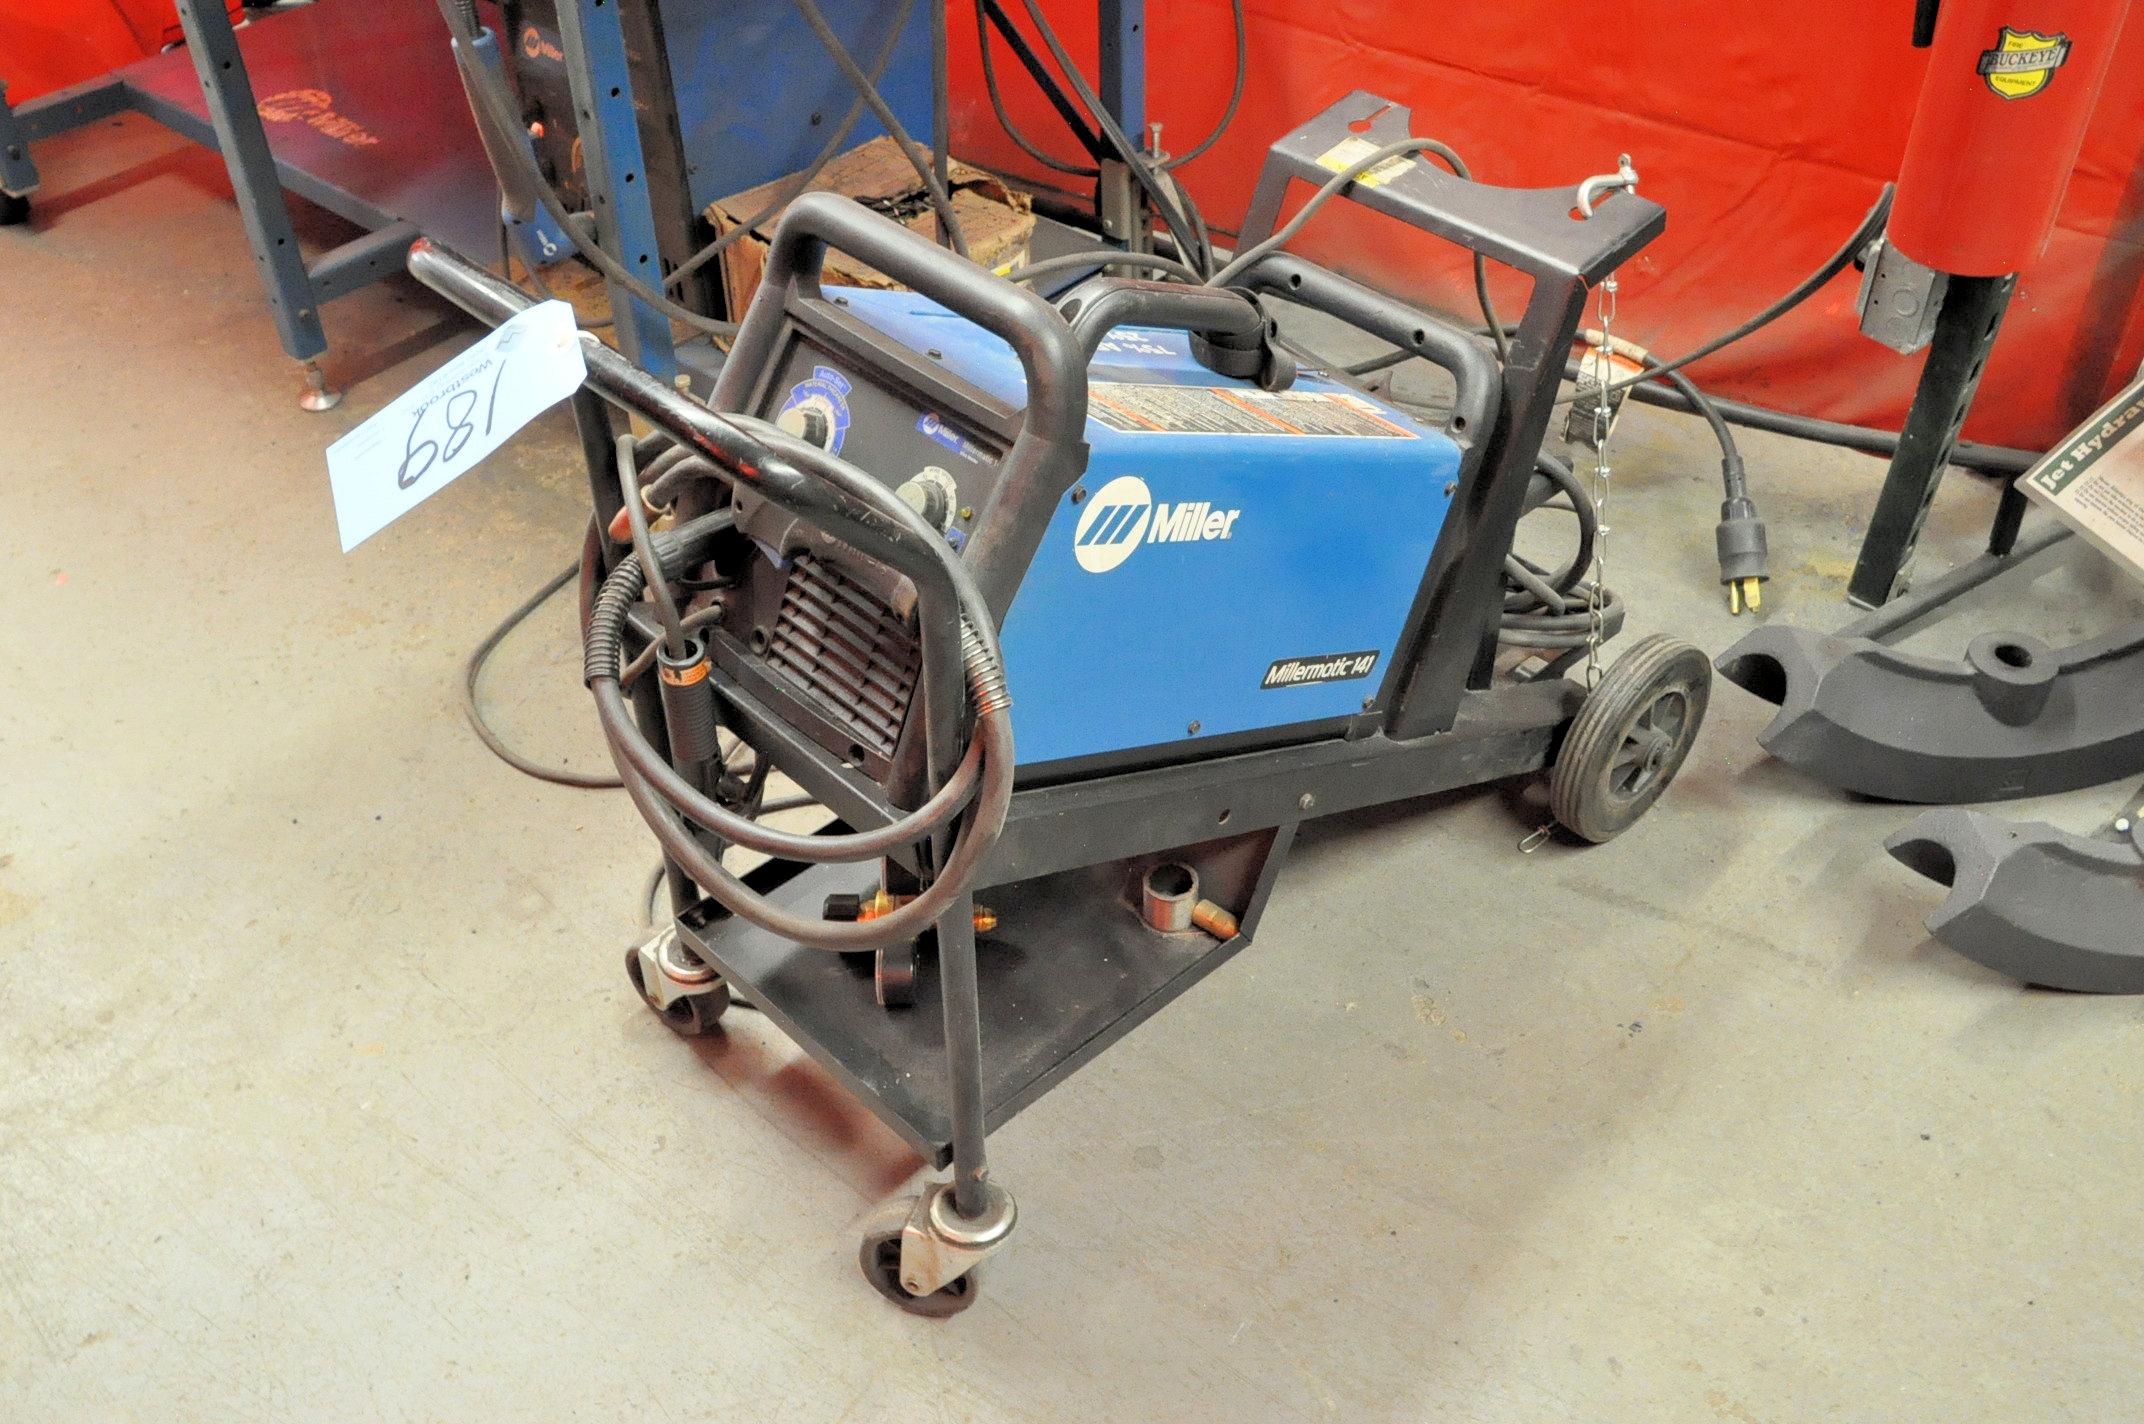 Miller Millermatic 141, 90-Amp Capacity Wire Feed Mig Welder,